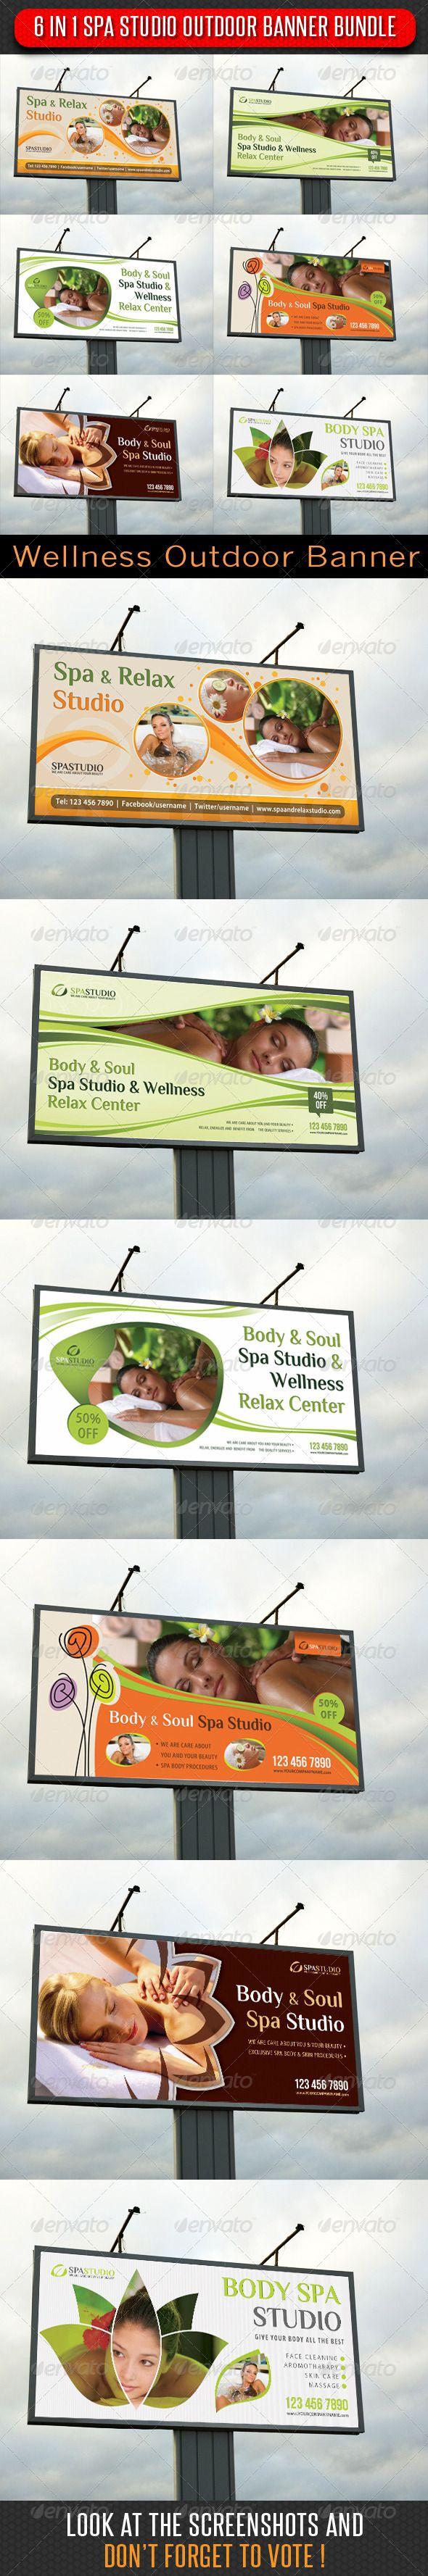 6 in 1 Spa Studio Outdoor Billboard Banner Bundle Template PSD. Download here: http://graphicriver.net/item/6-in-1-spa-studio-outdoor-banner-bundle/6359271?s_rank=299&ref=yinkira